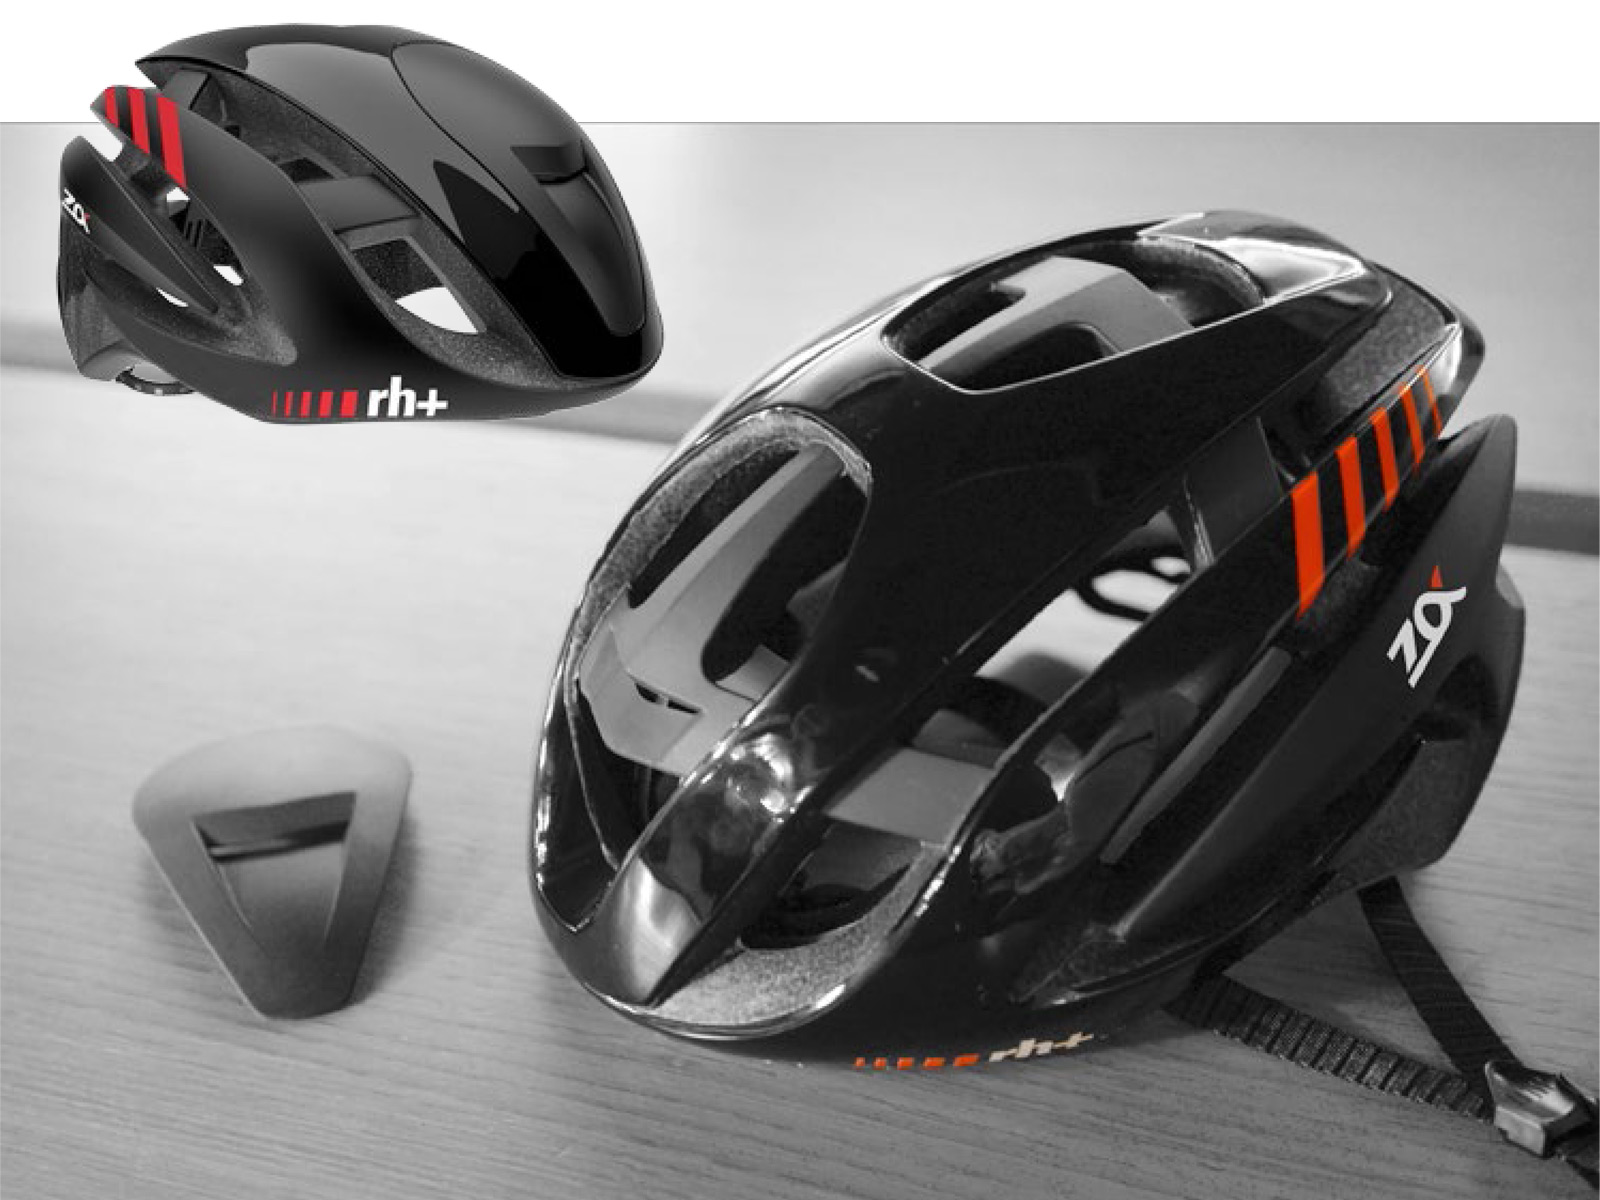 cee38f754 rh+ Z-Alpha Black MIPS helmet rh+ -Z-Alpha aero-helmet removable-aero-cover